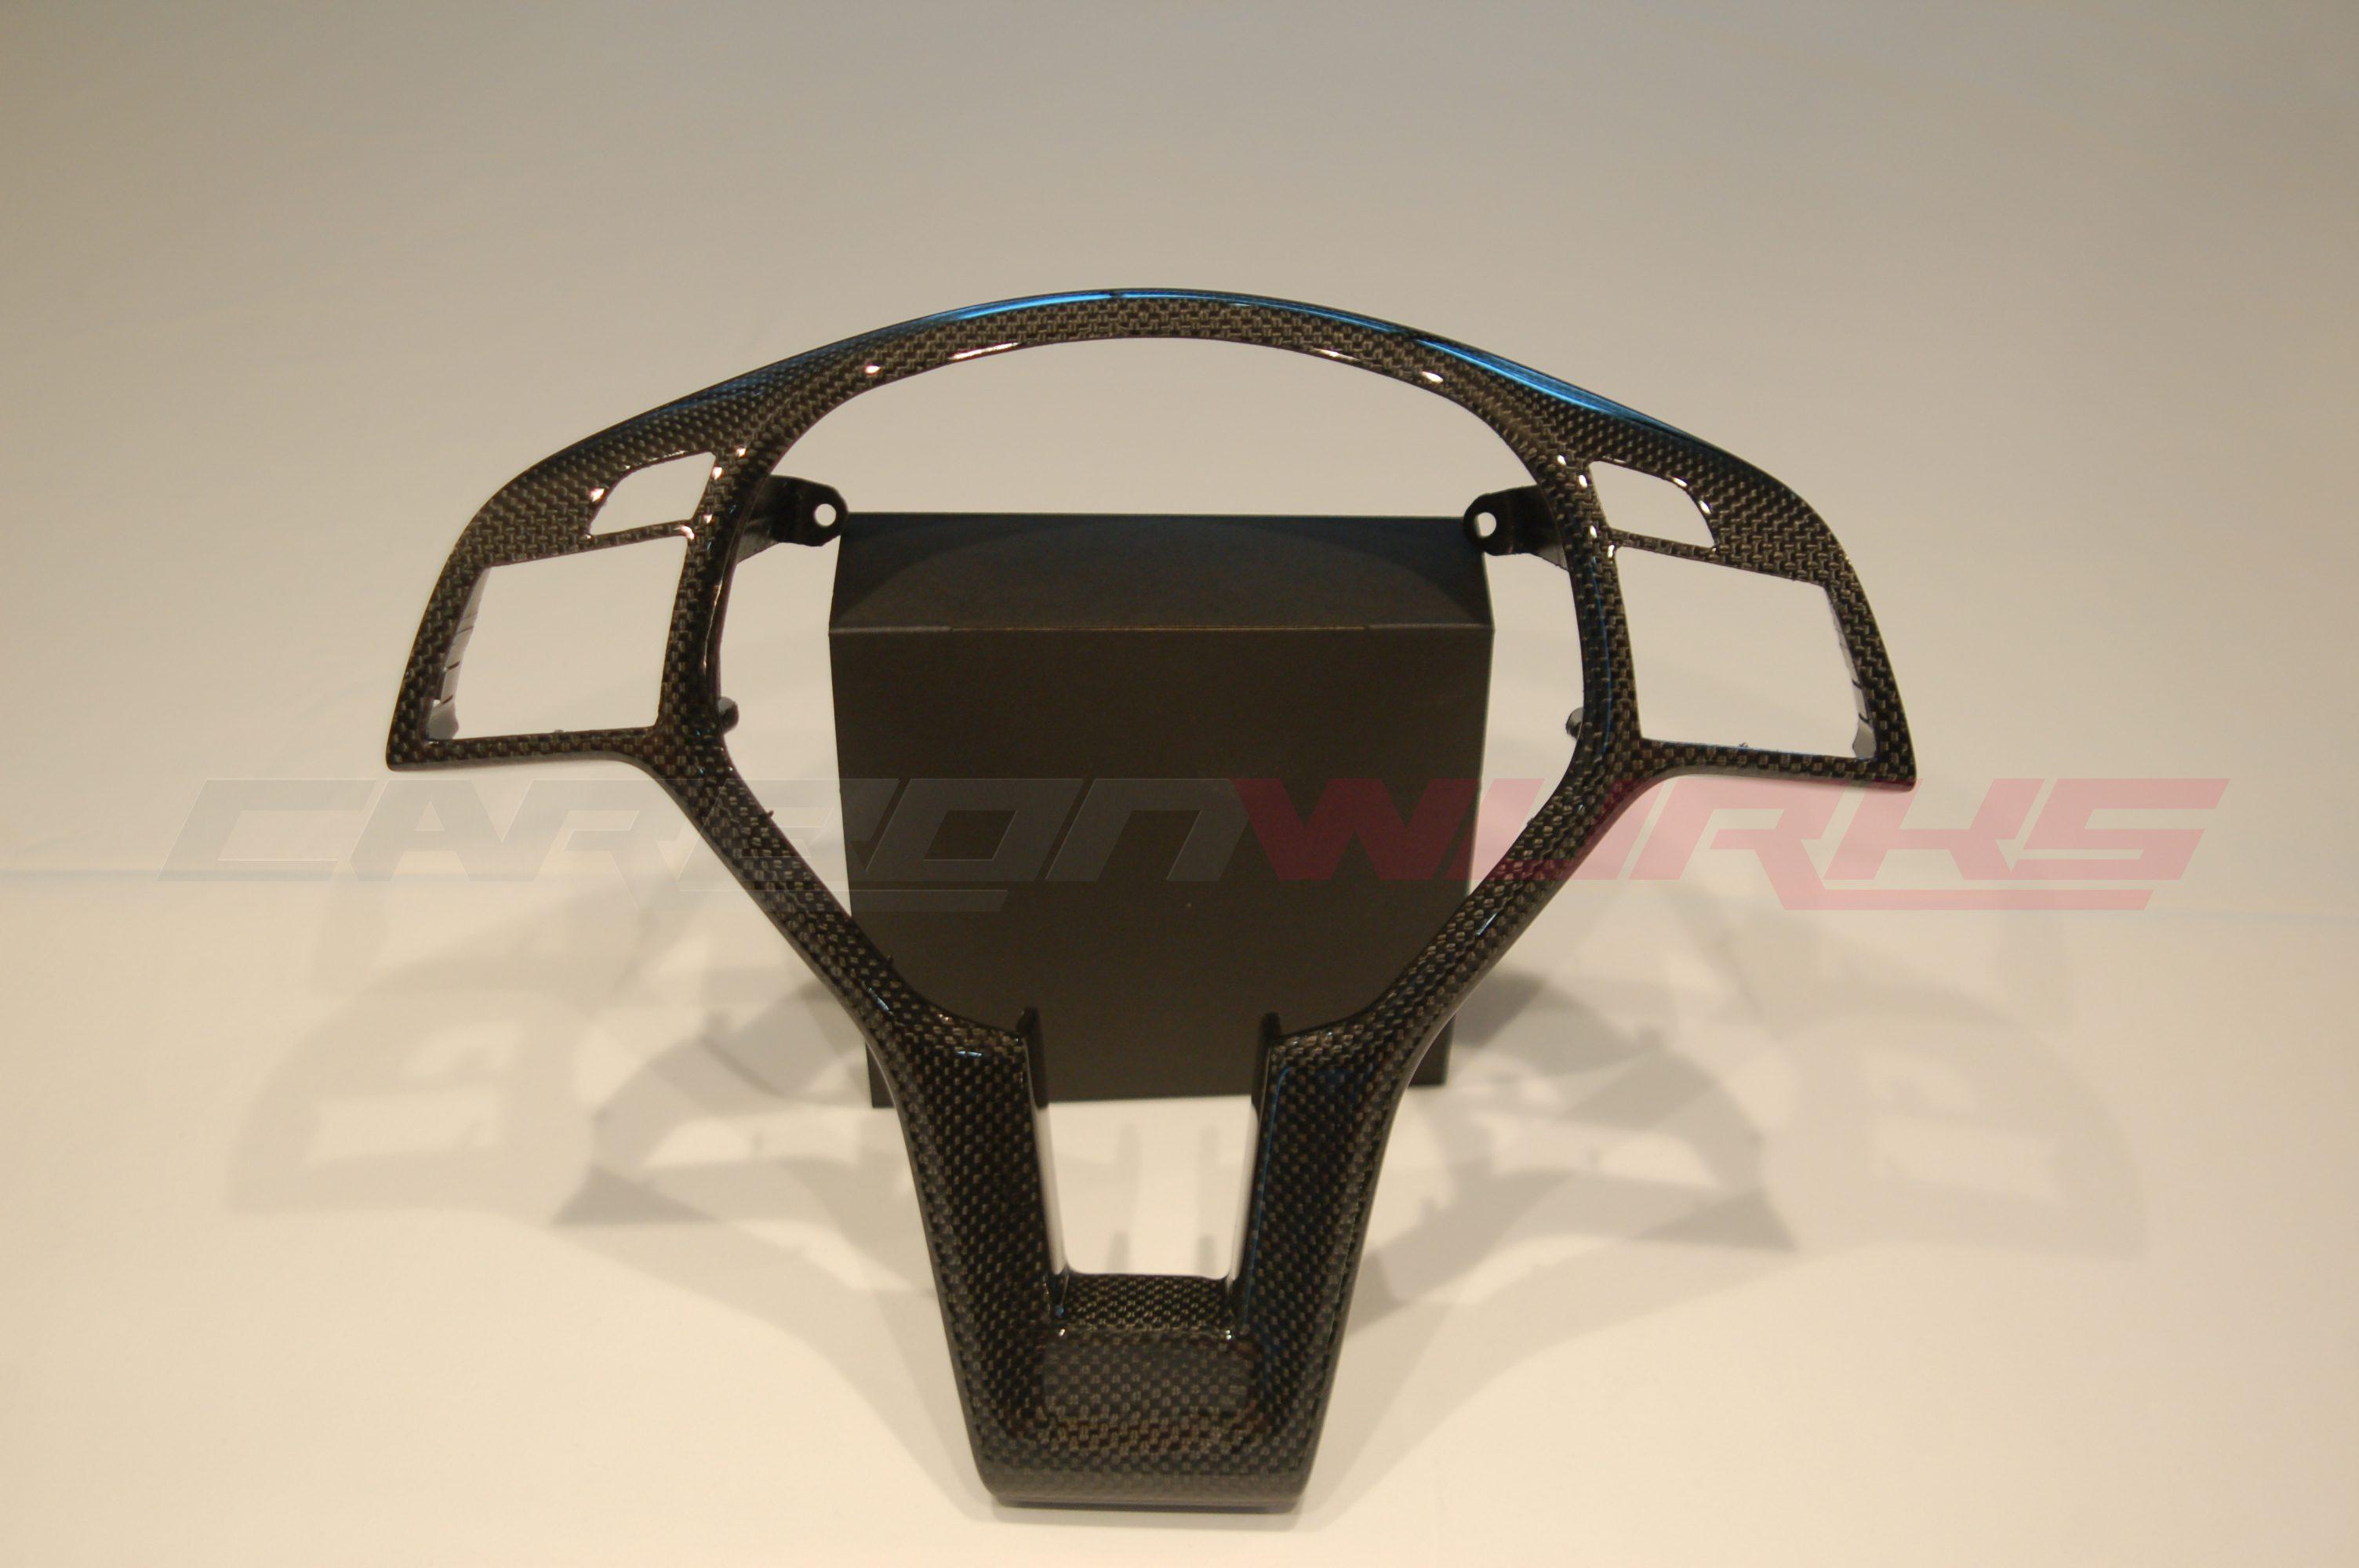 Mercedes Benz Carbon Fibre Steering Wheel Trim